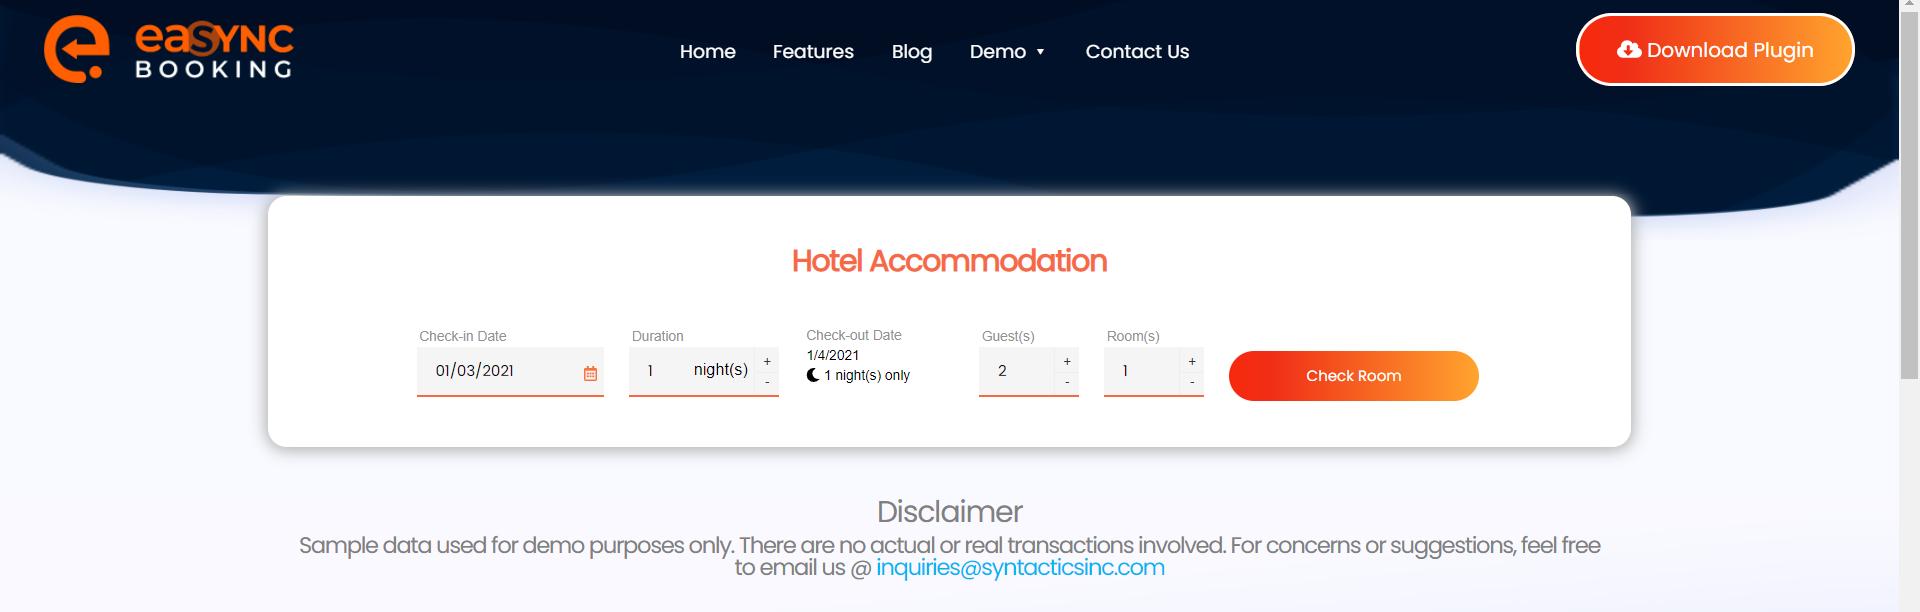 EaSync Hotel Booking Plugin Hotel Accommodation